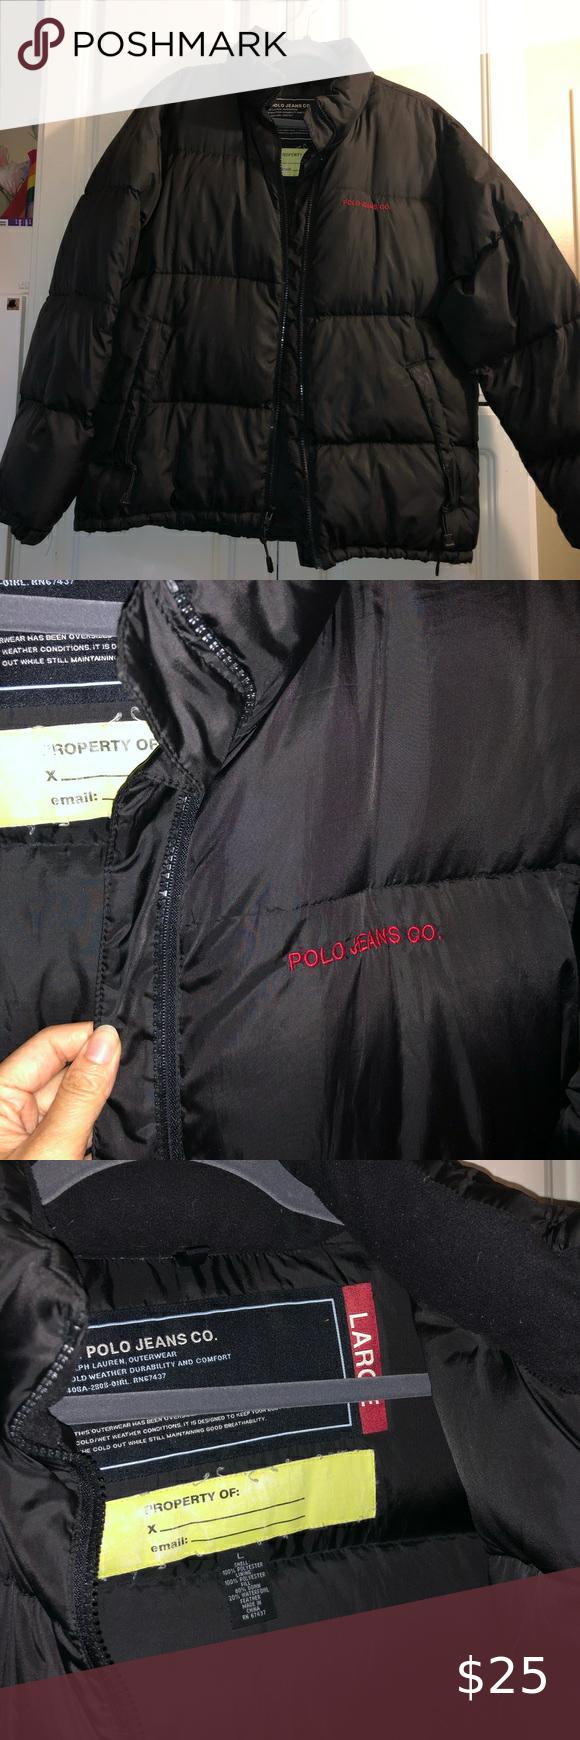 Ralph Lauren Polo Jean Co Black Jacket Polo Jeans Polo Ralph Lauren Black Jacket [ 1740 x 580 Pixel ]